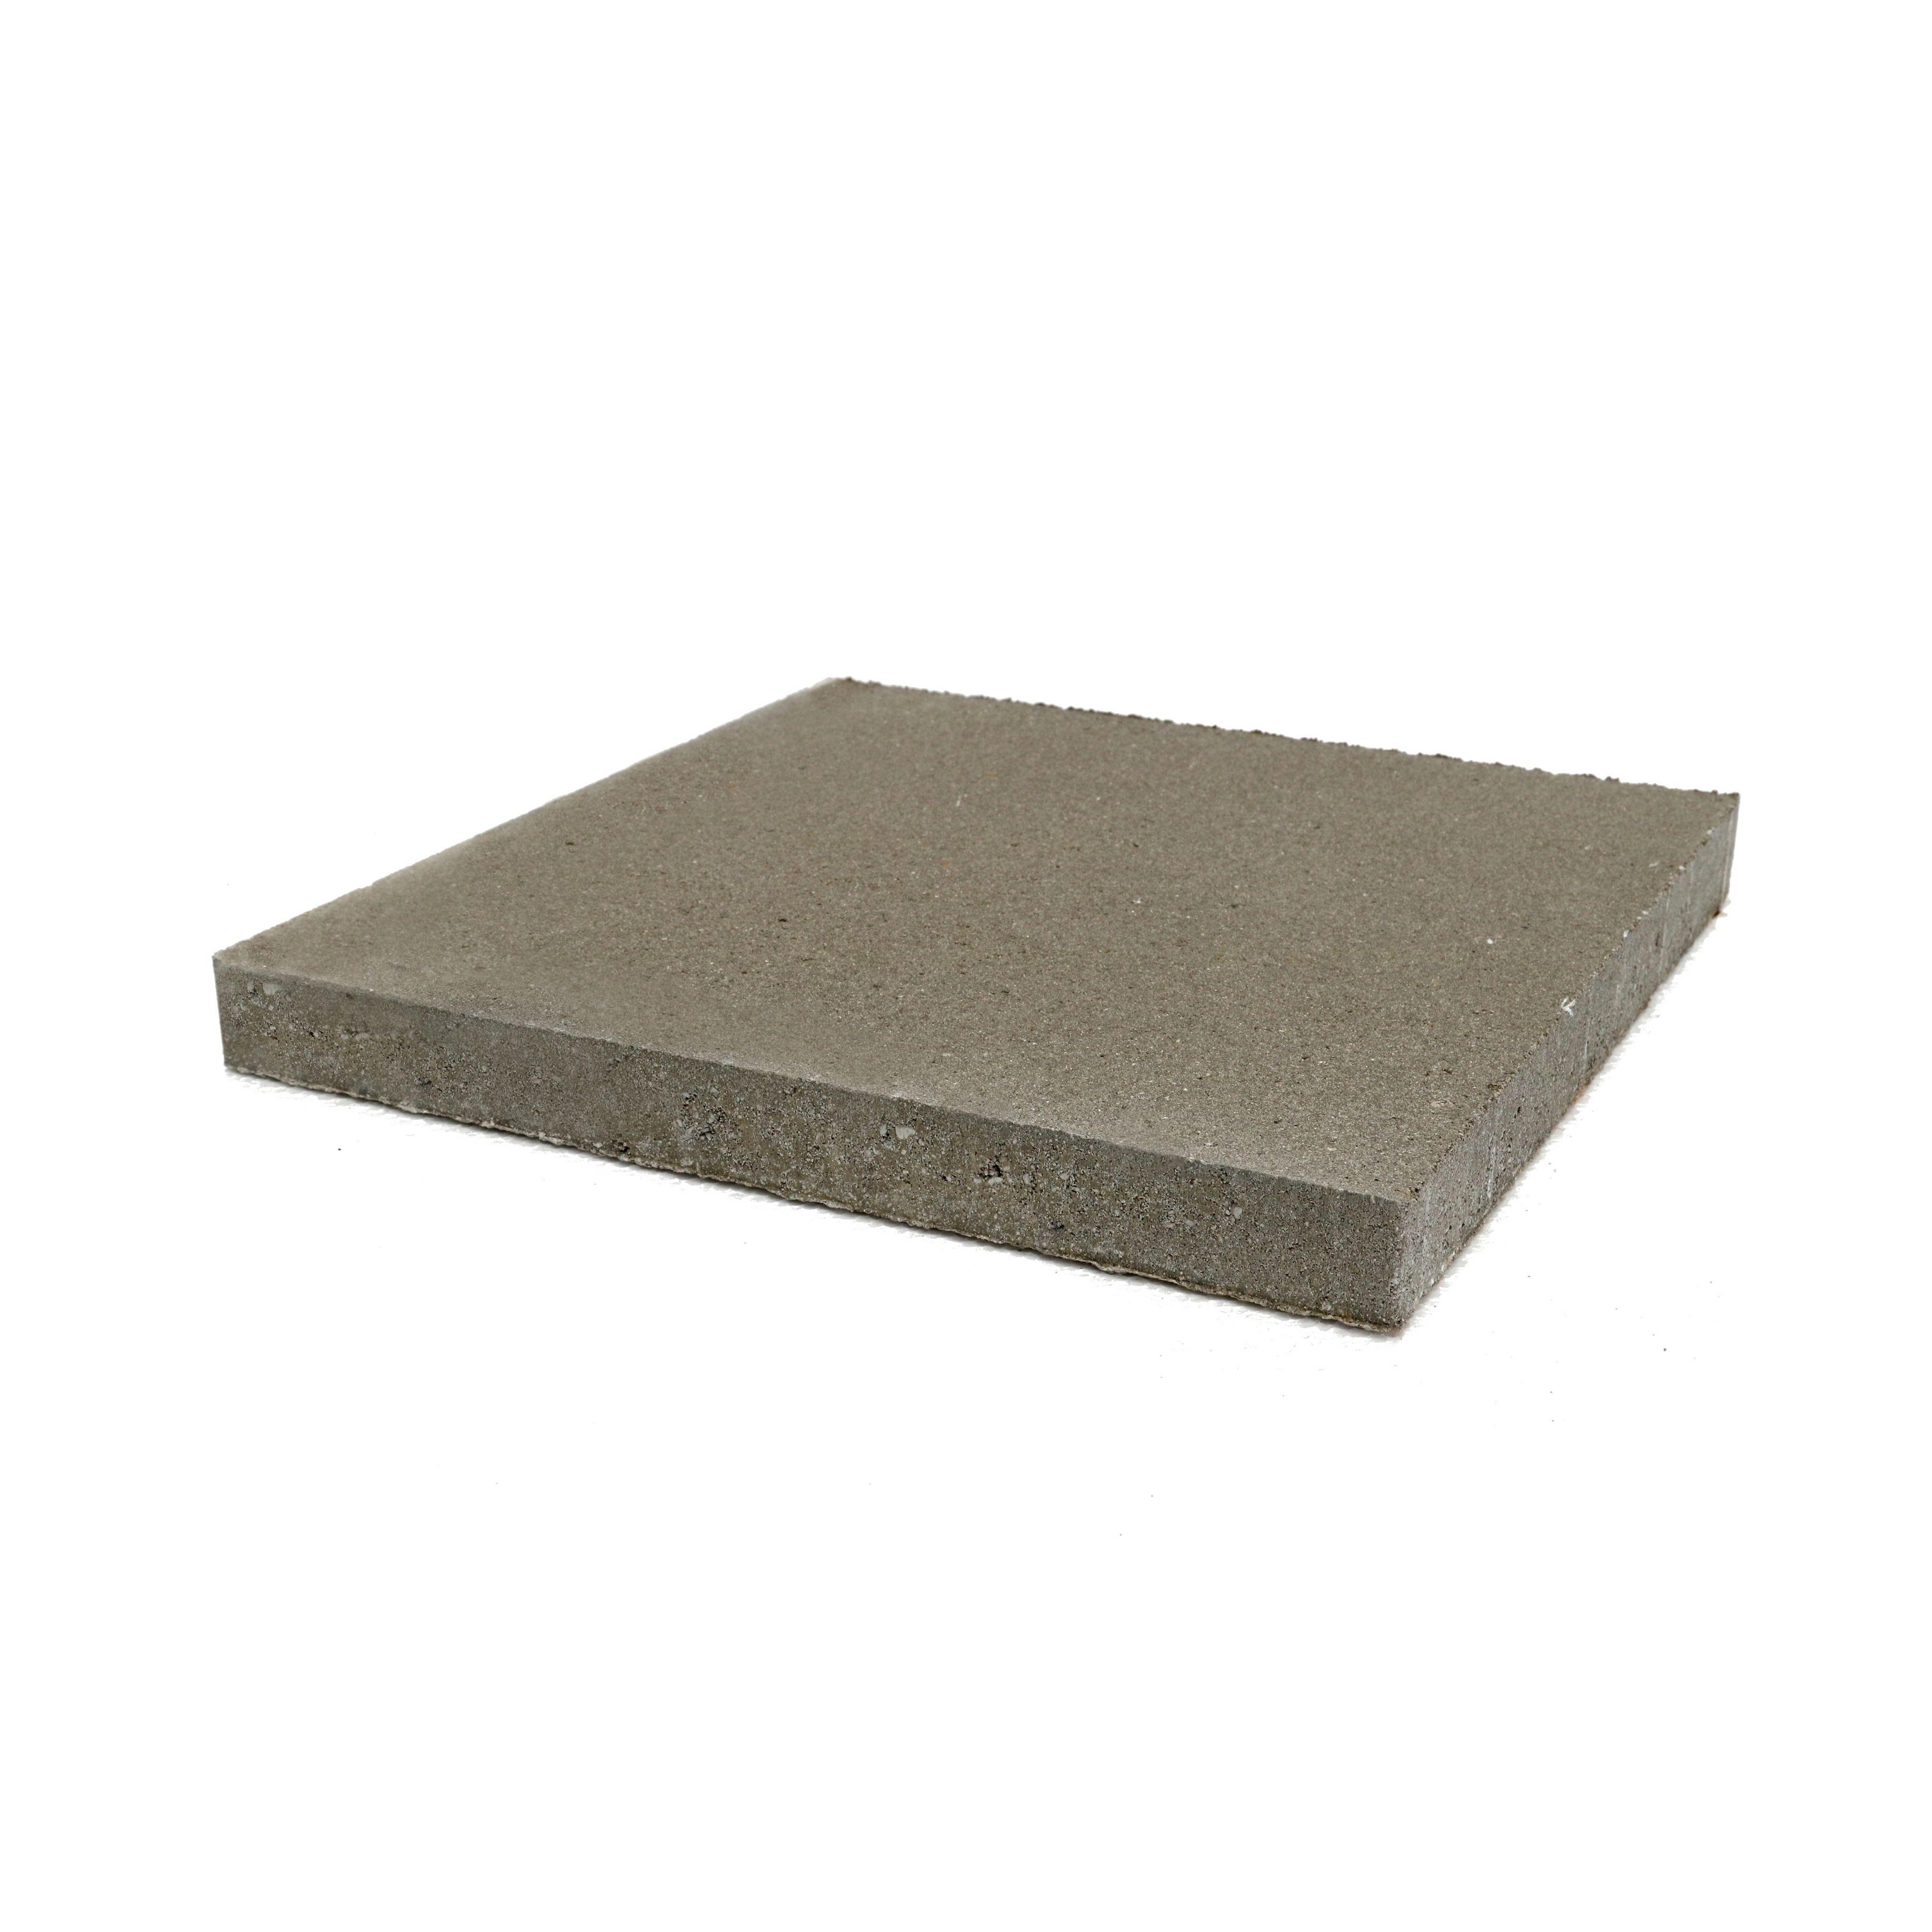 Terrastegels 40x40 Grijs.Betontegel Grijs 40x40 Cm 84 Tegels 13 44 M2 Products